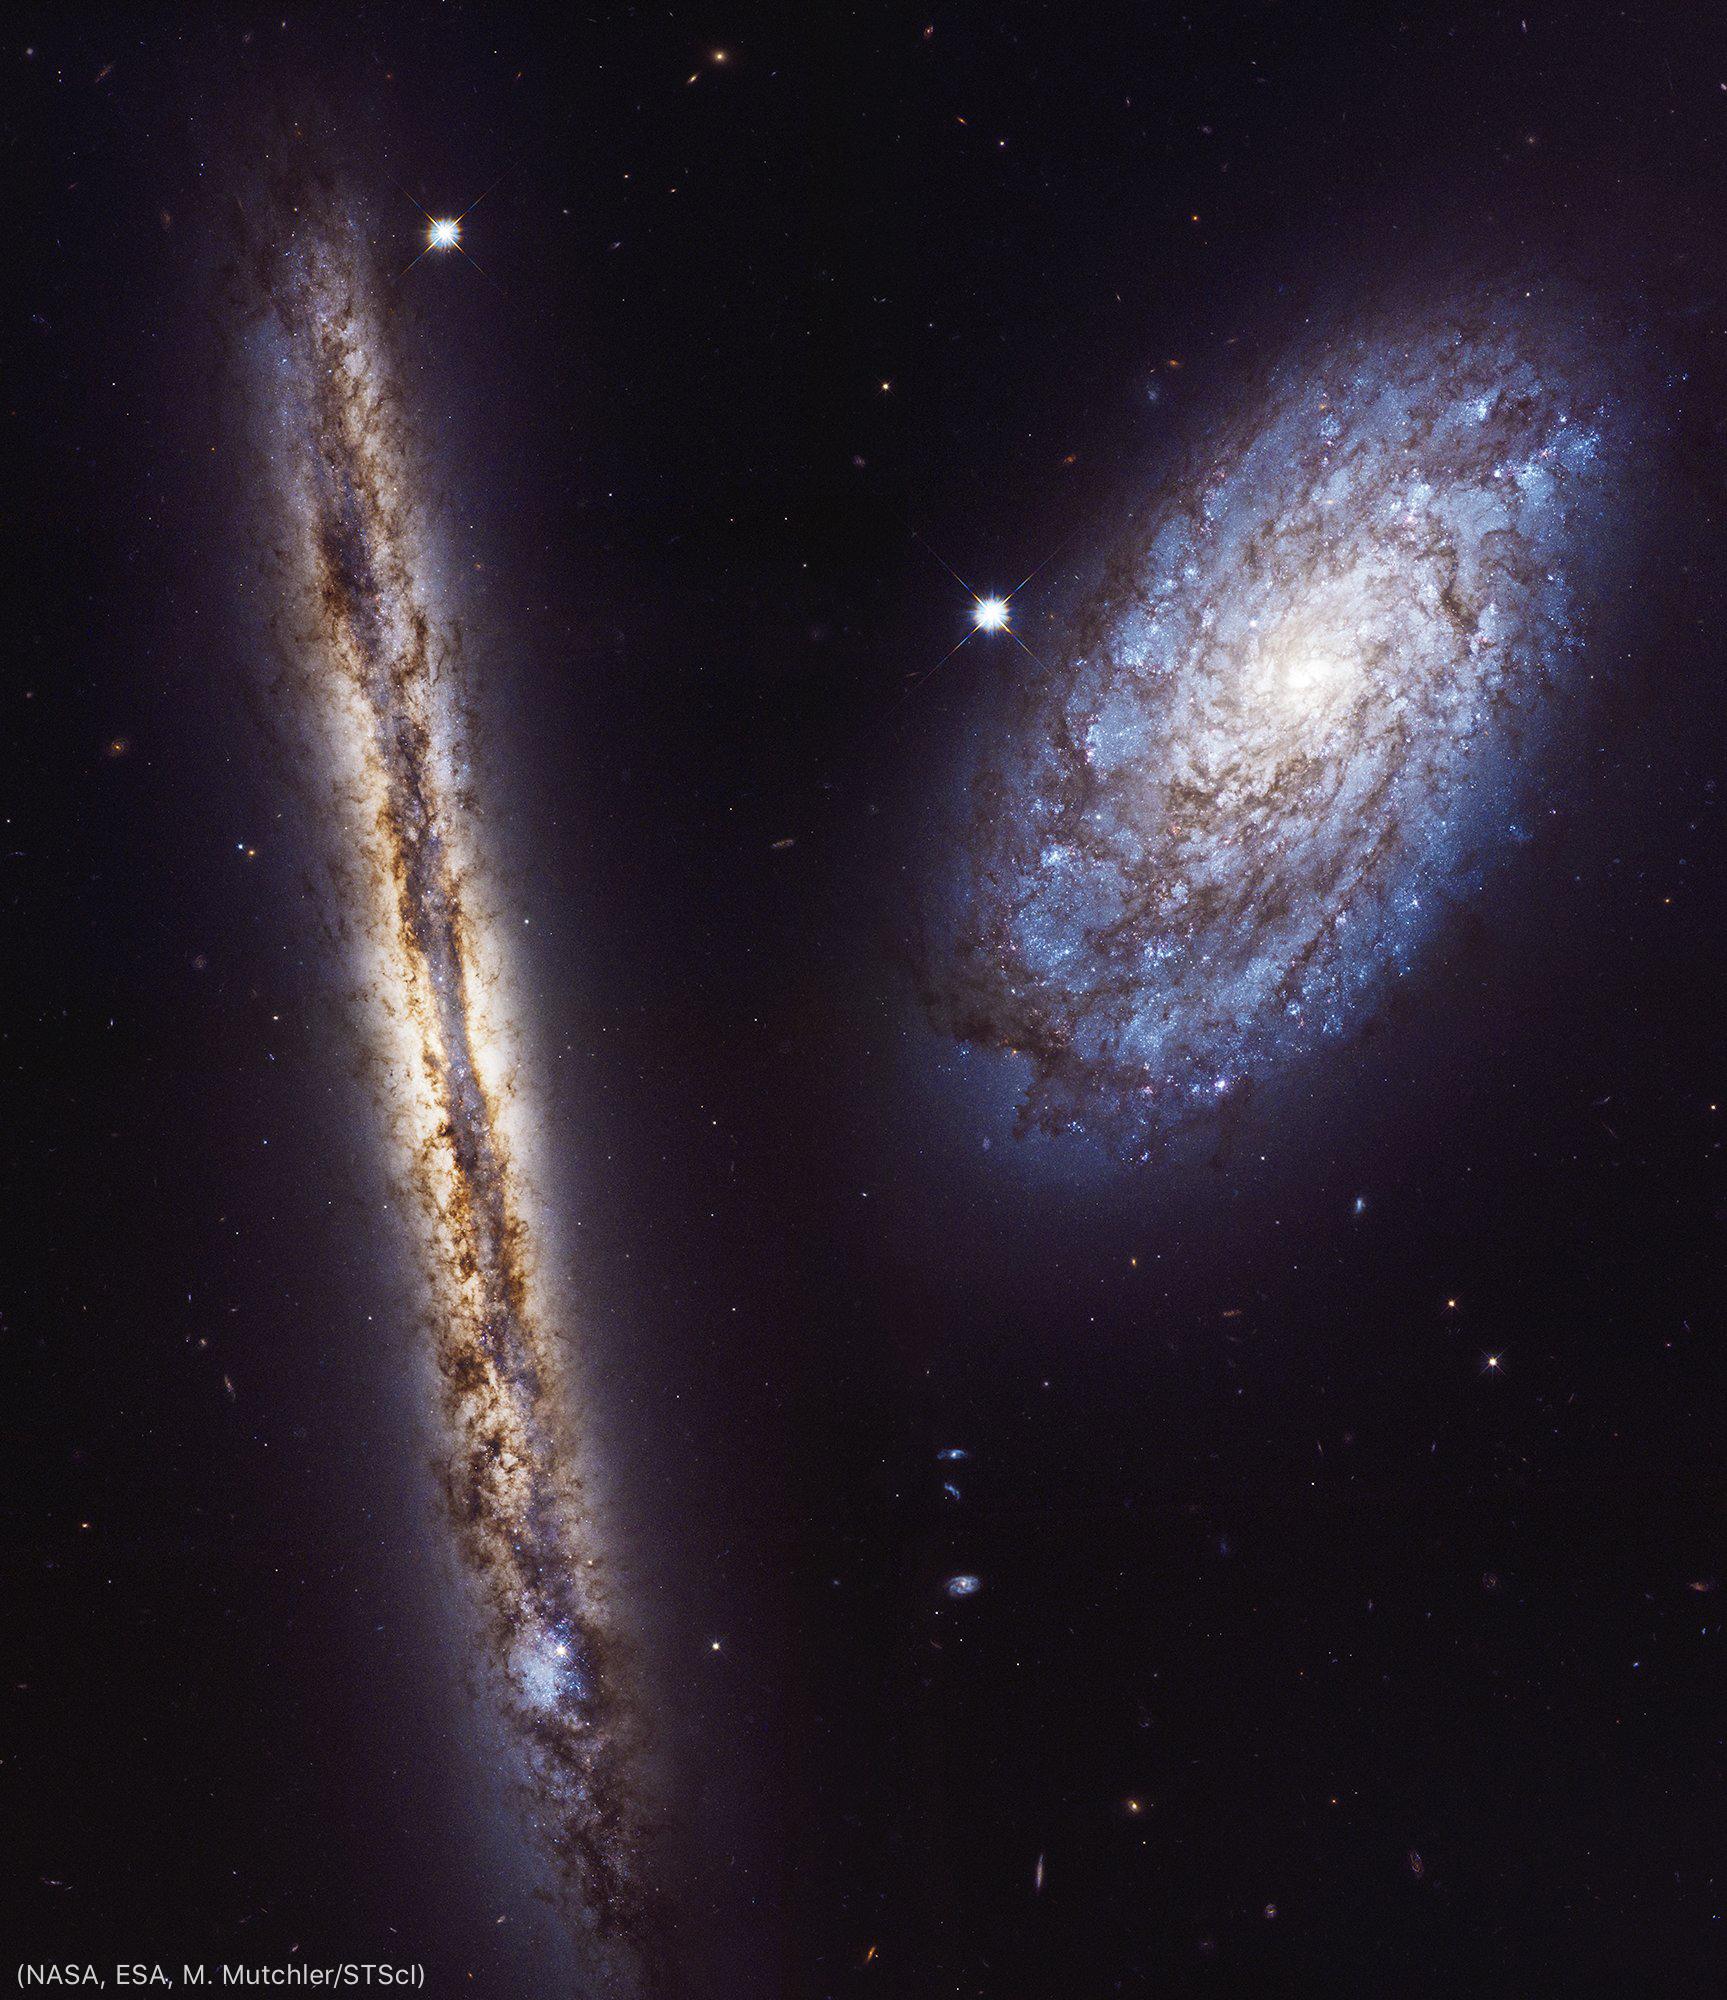 Two galaxies (NASA, ESA, M. Mutchler/STScI)